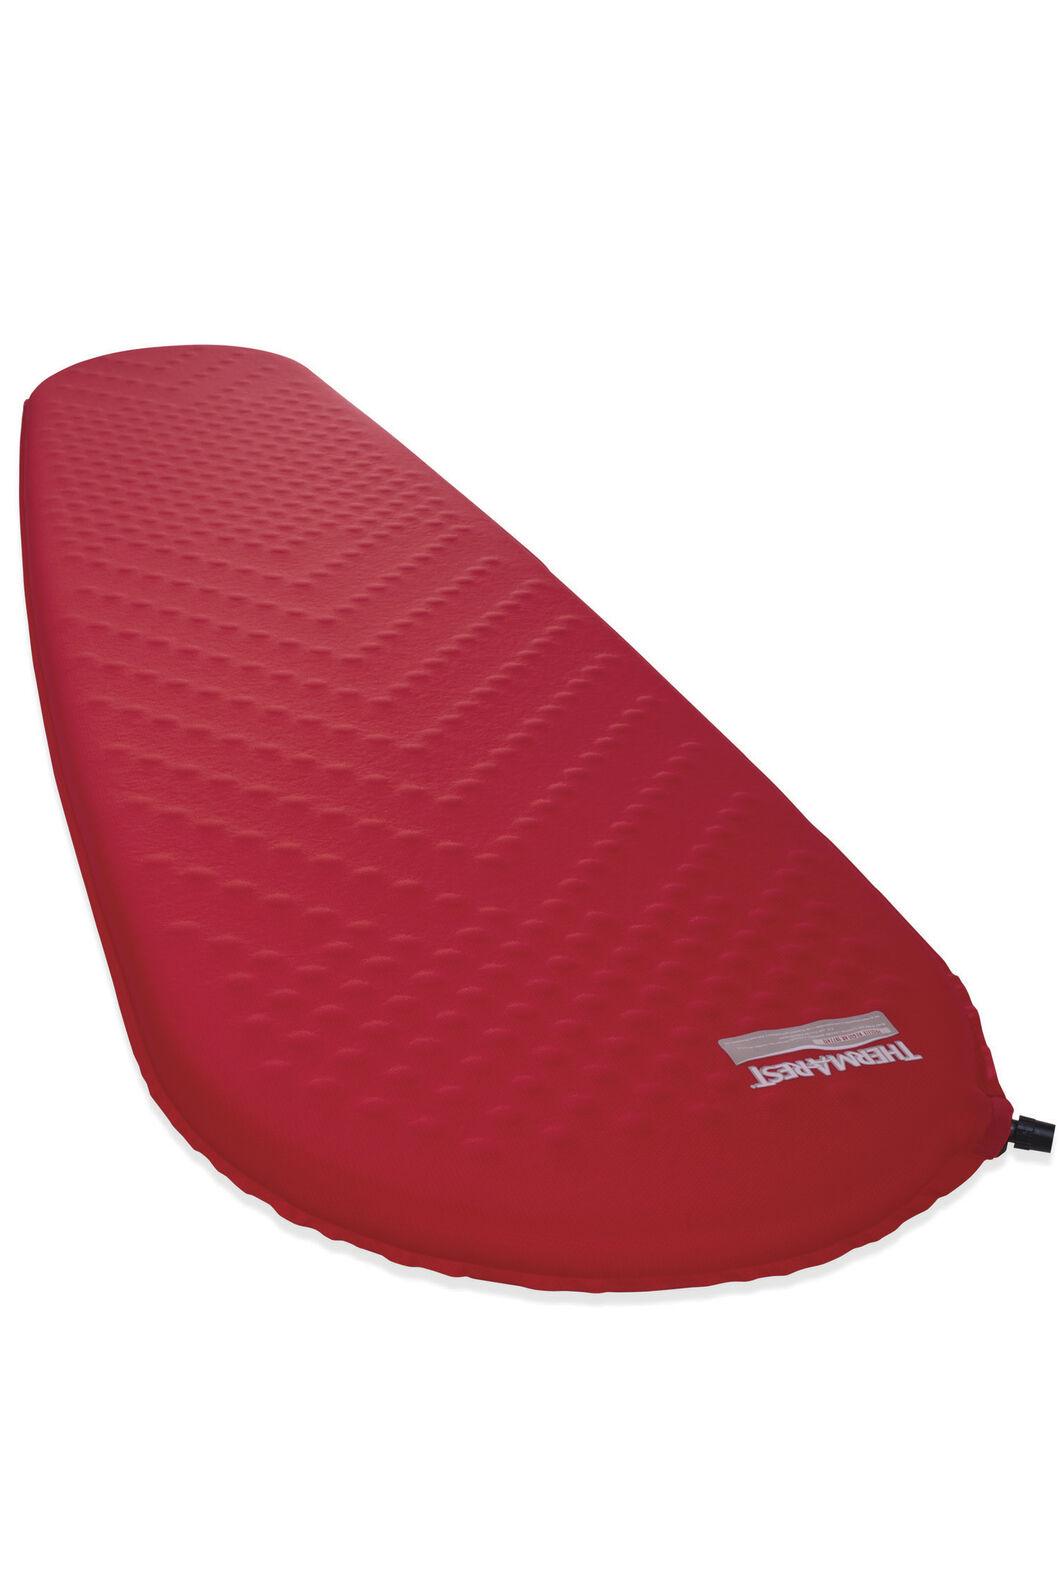 Thermarest ProLite™ Plus Women's Sleeping Pad — Regular, Cayneene, hi-res